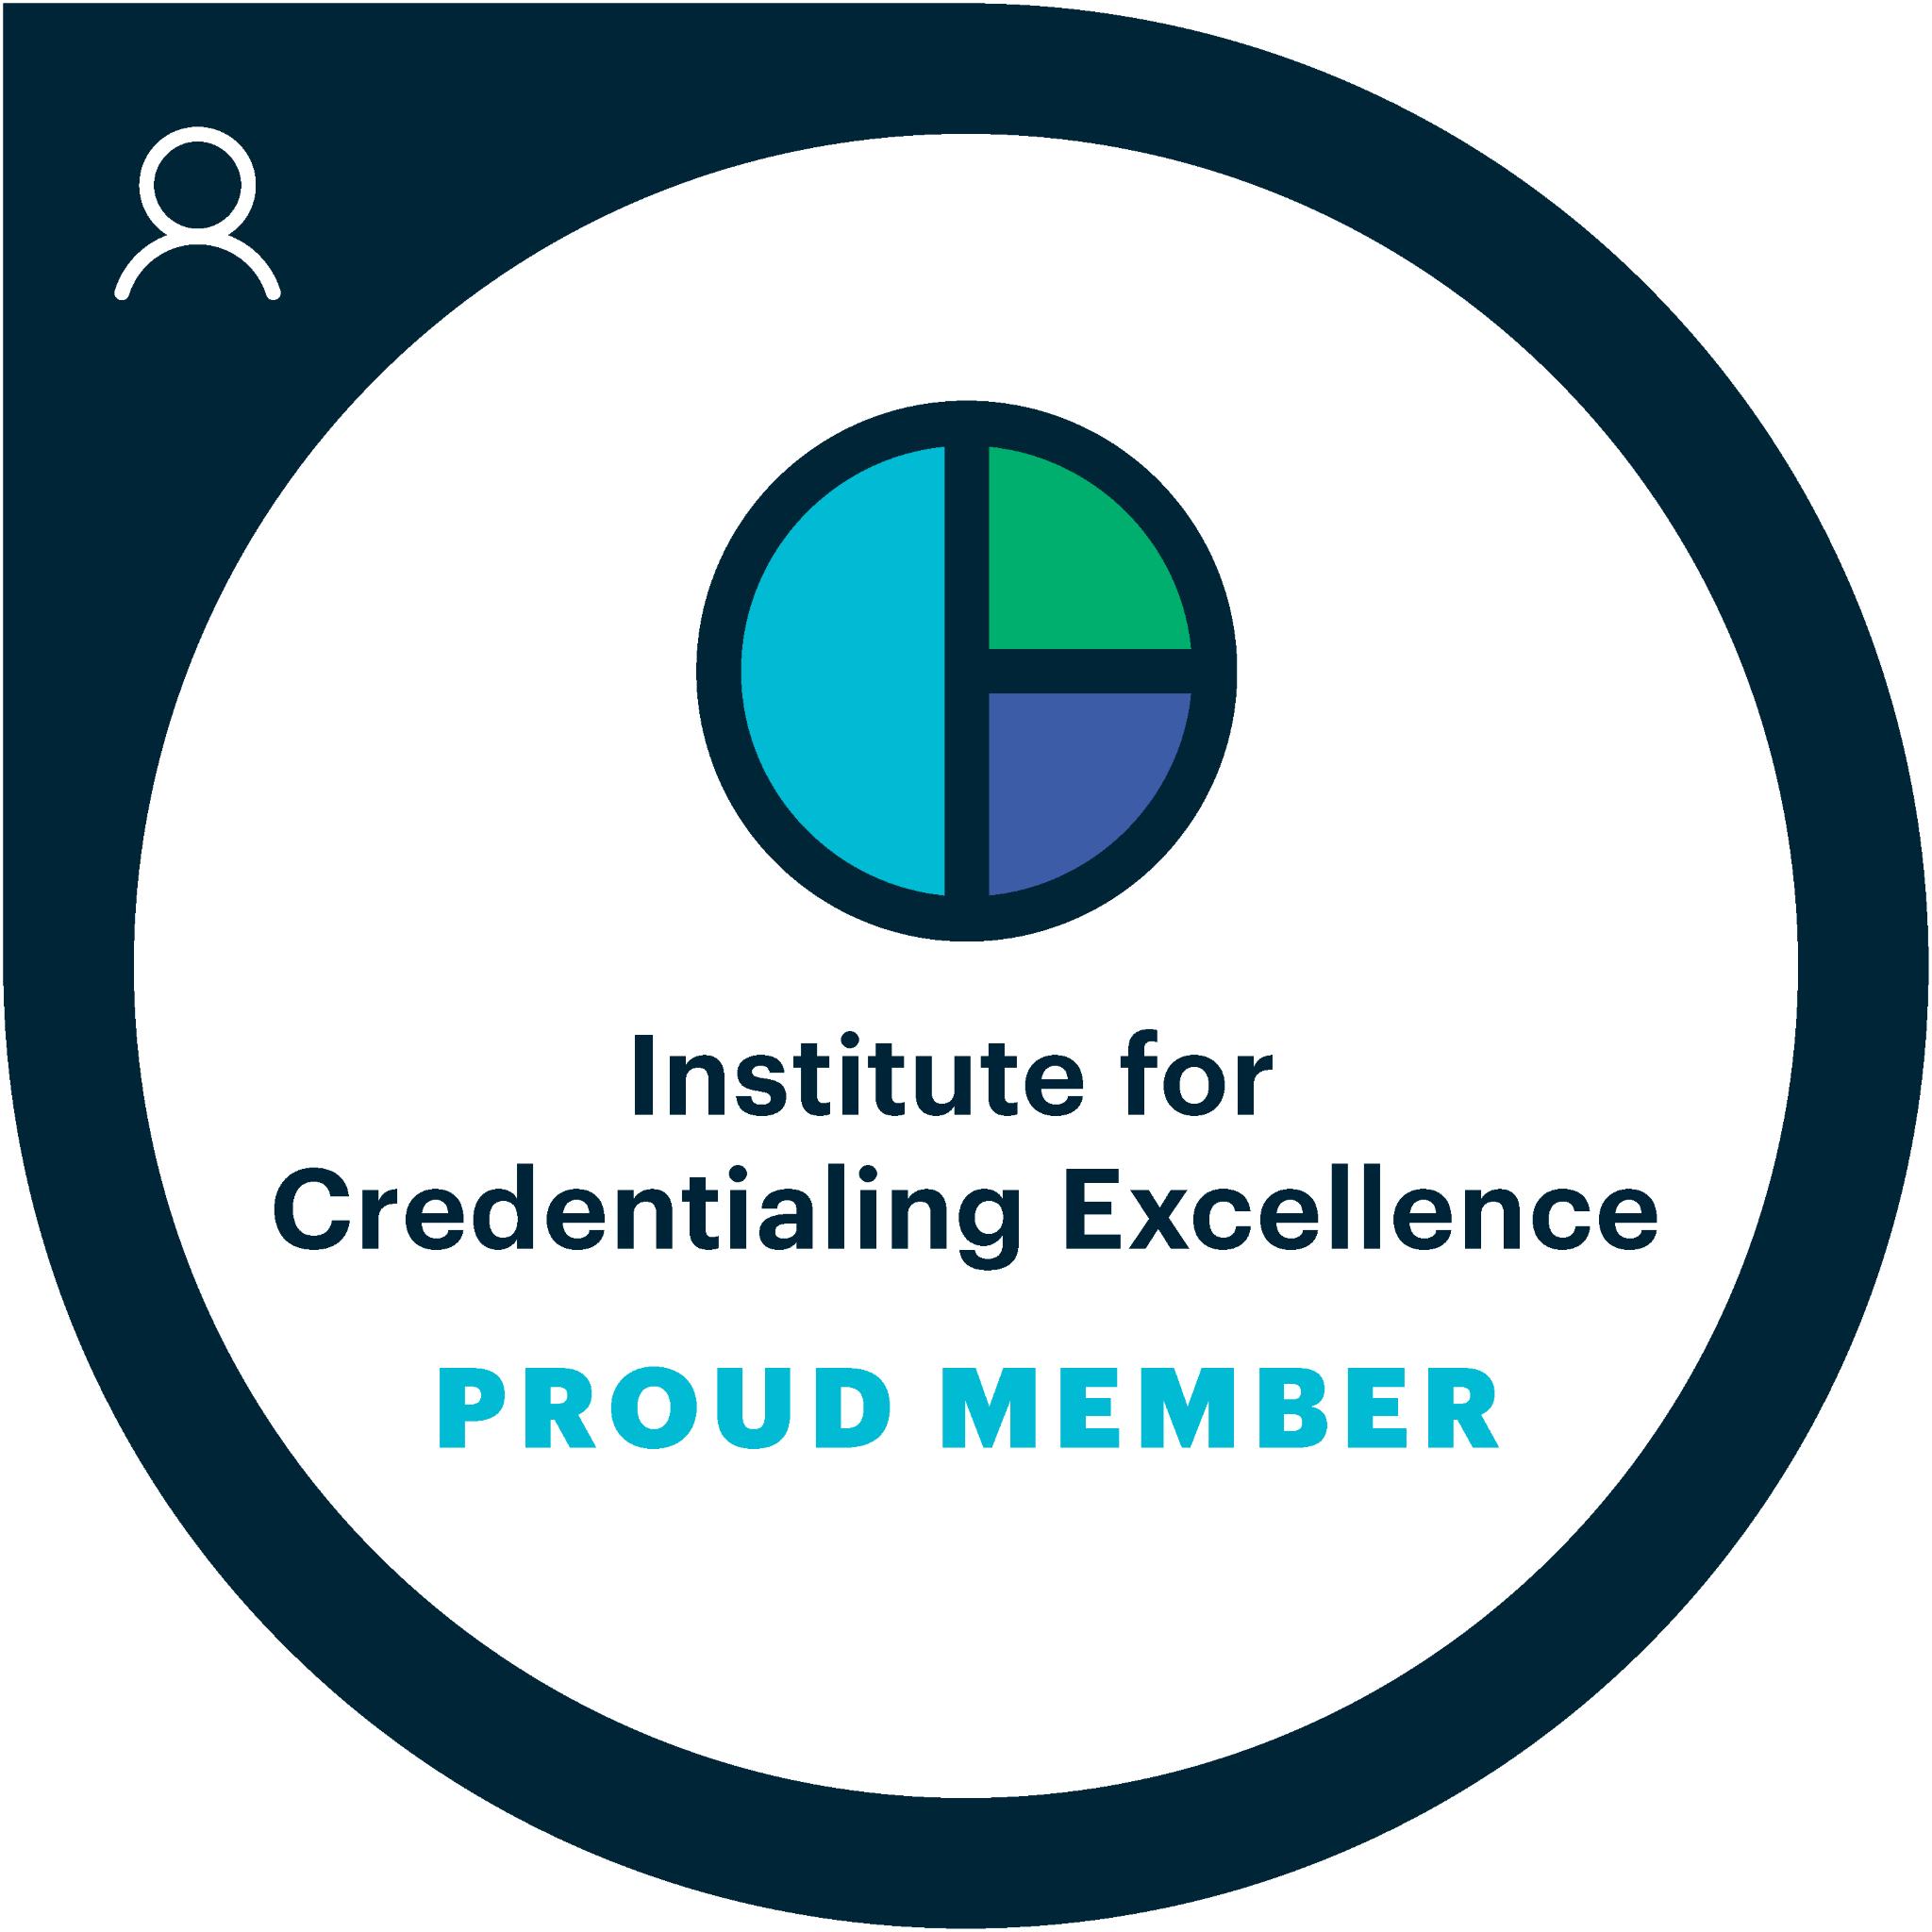 I.C.E. Organizational Member